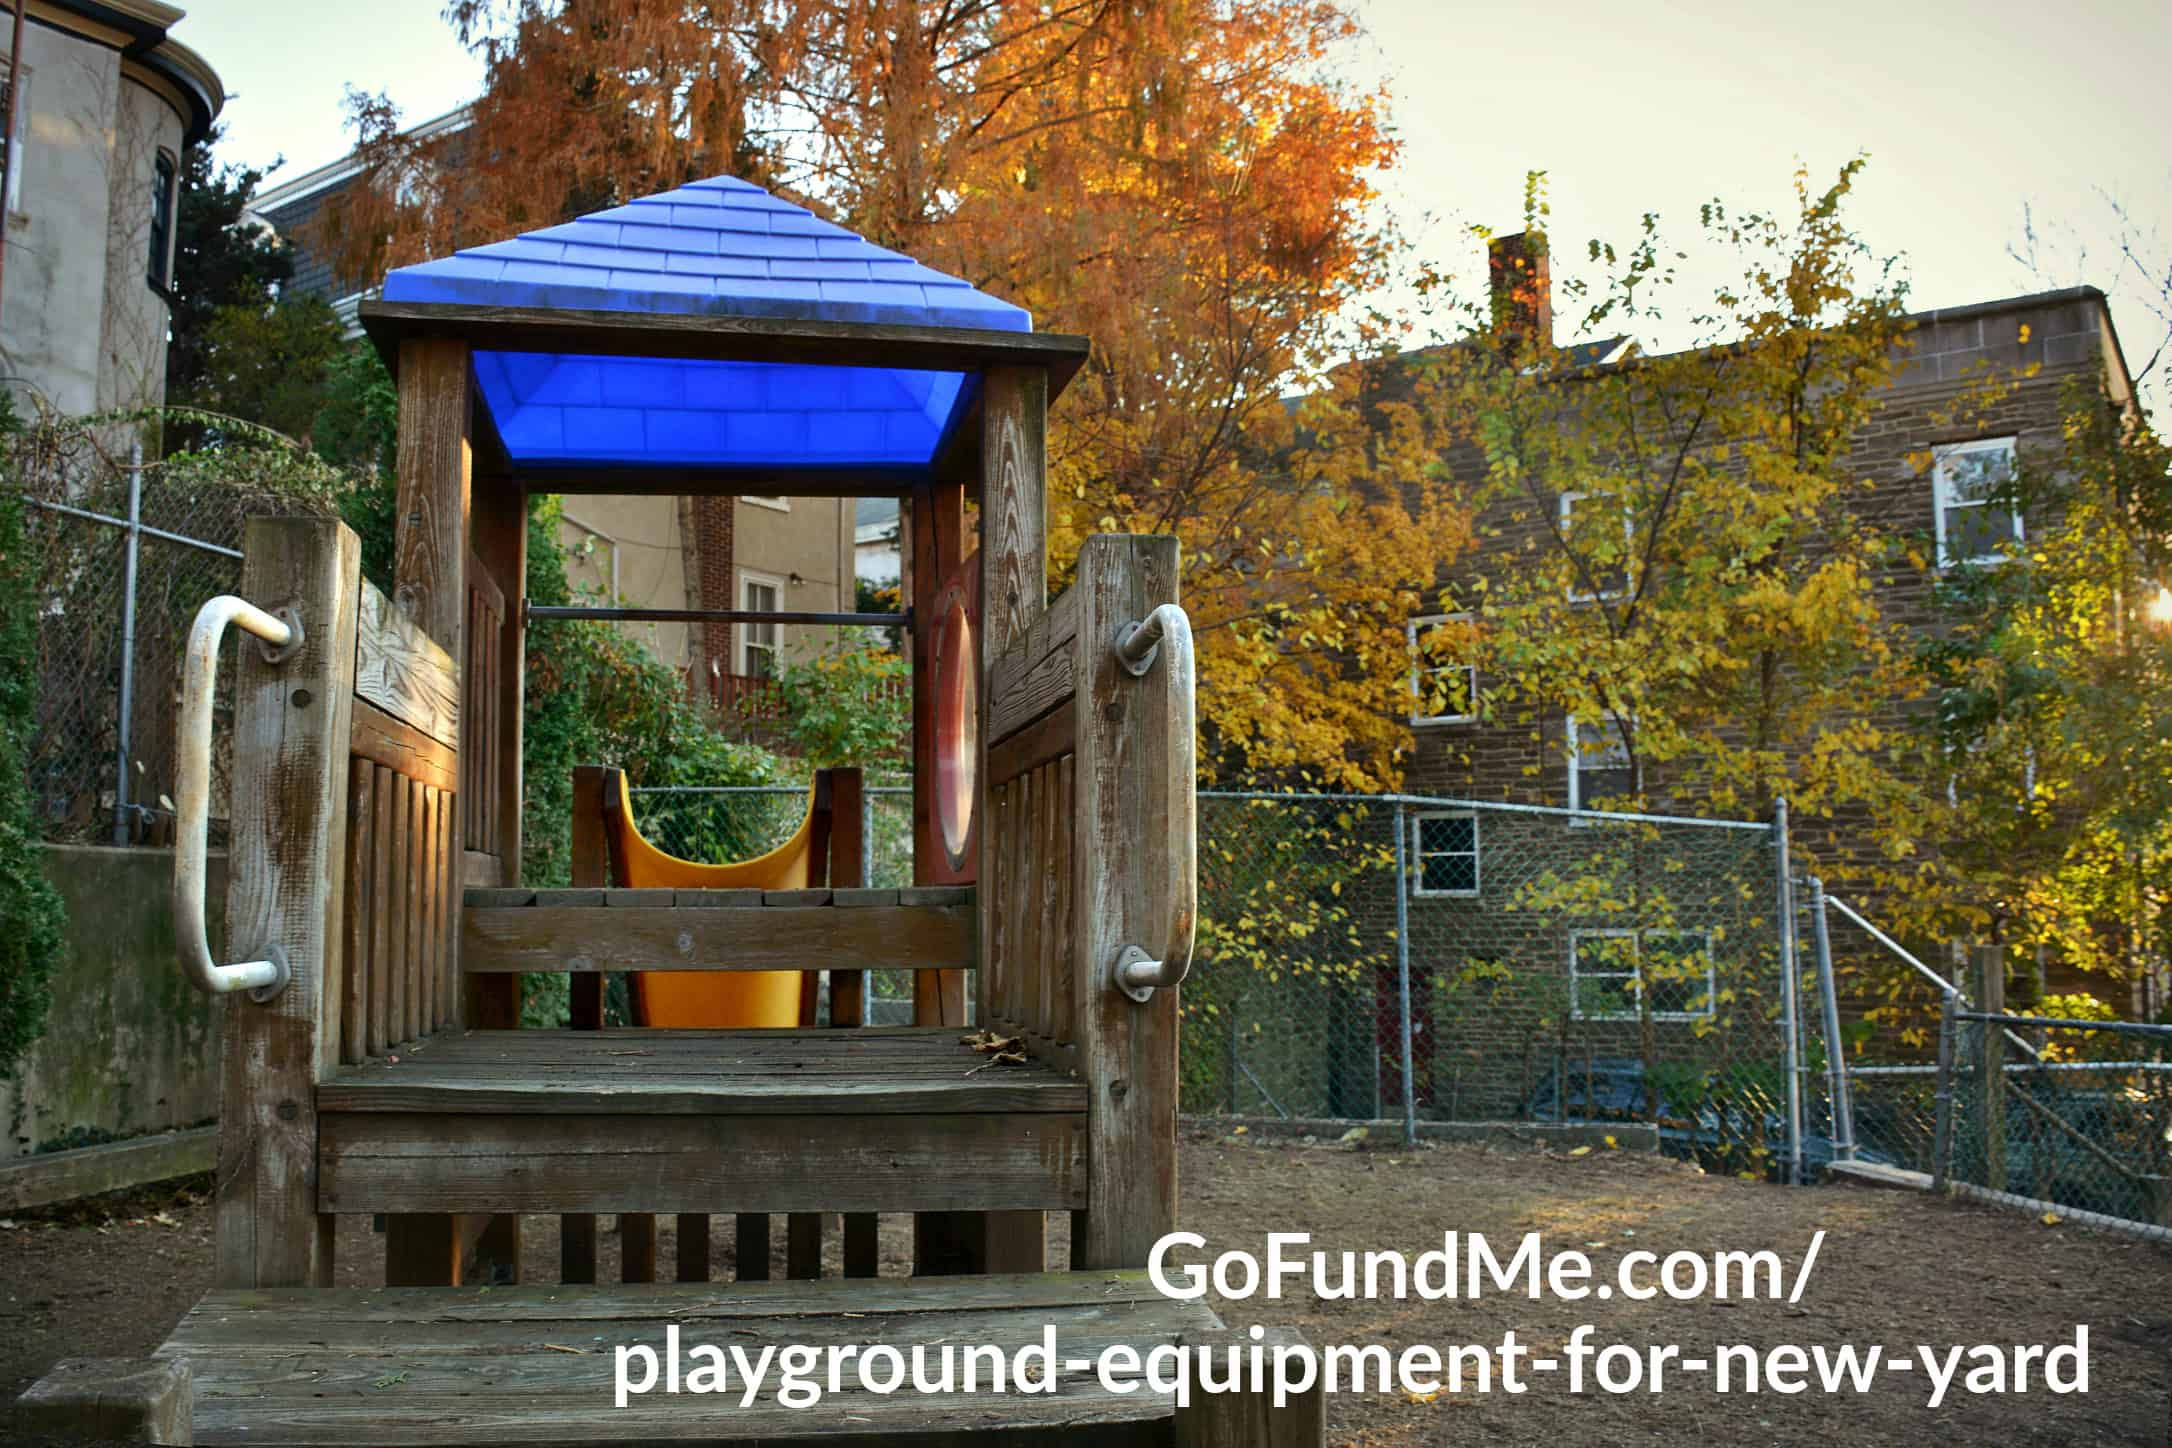 eastfallslocal-11-15-16-inside-fixed-playground-equipment-focus-txt